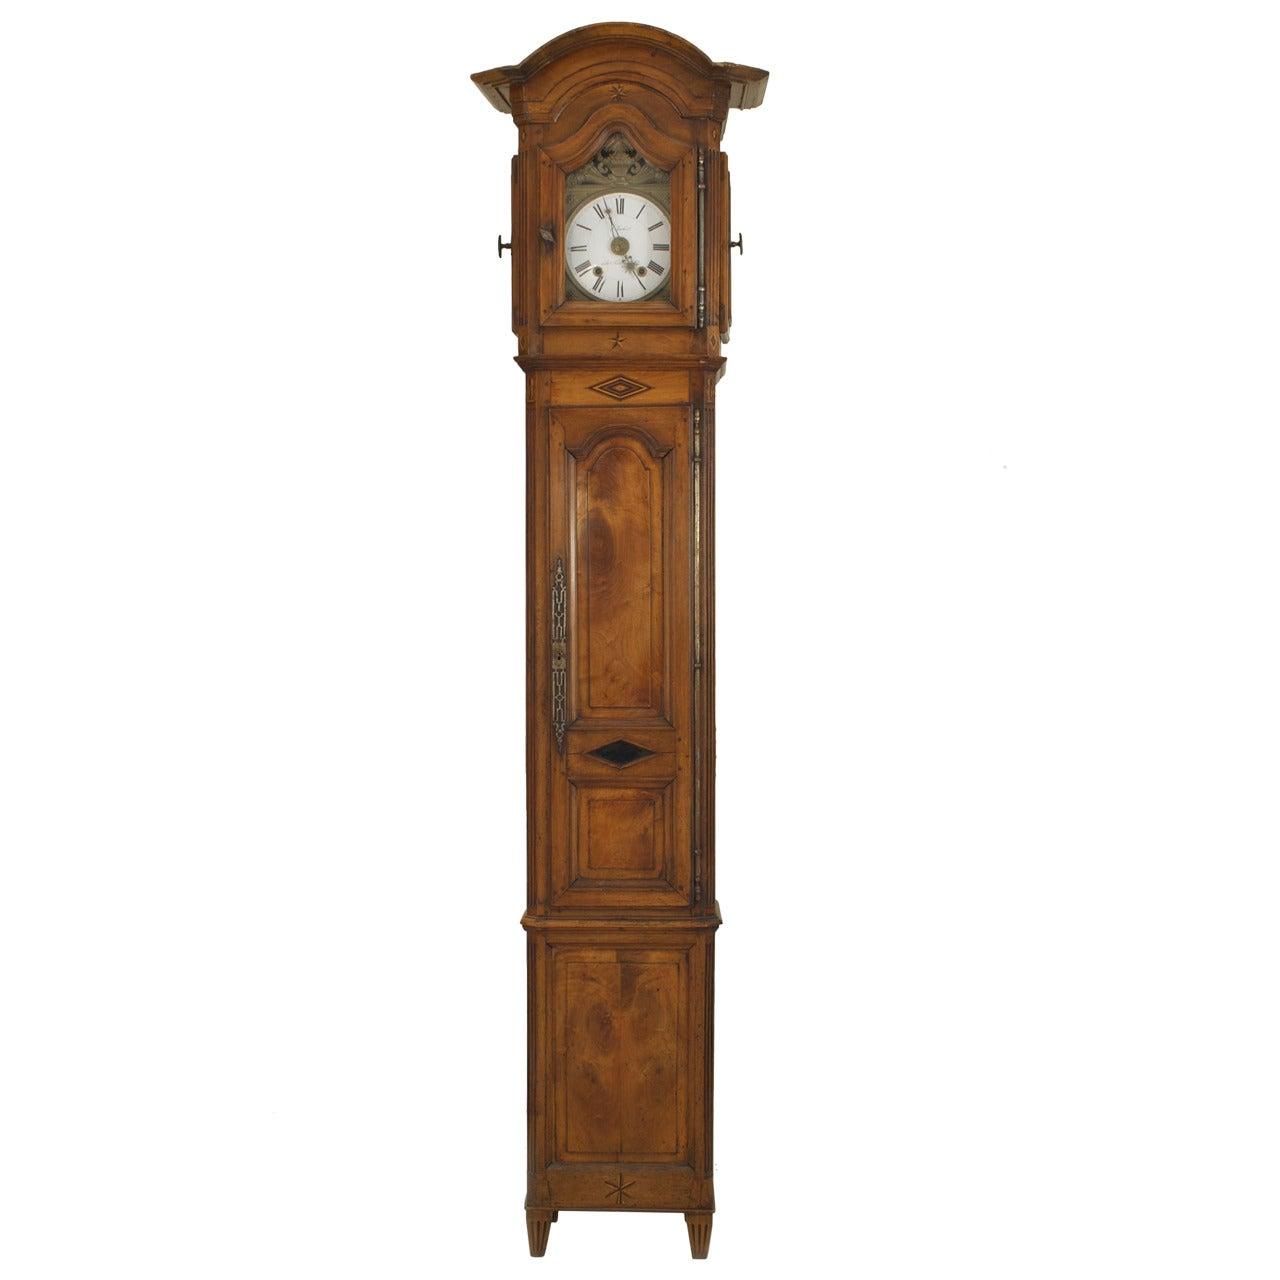 French Provincial Walnut Grandfather Clock